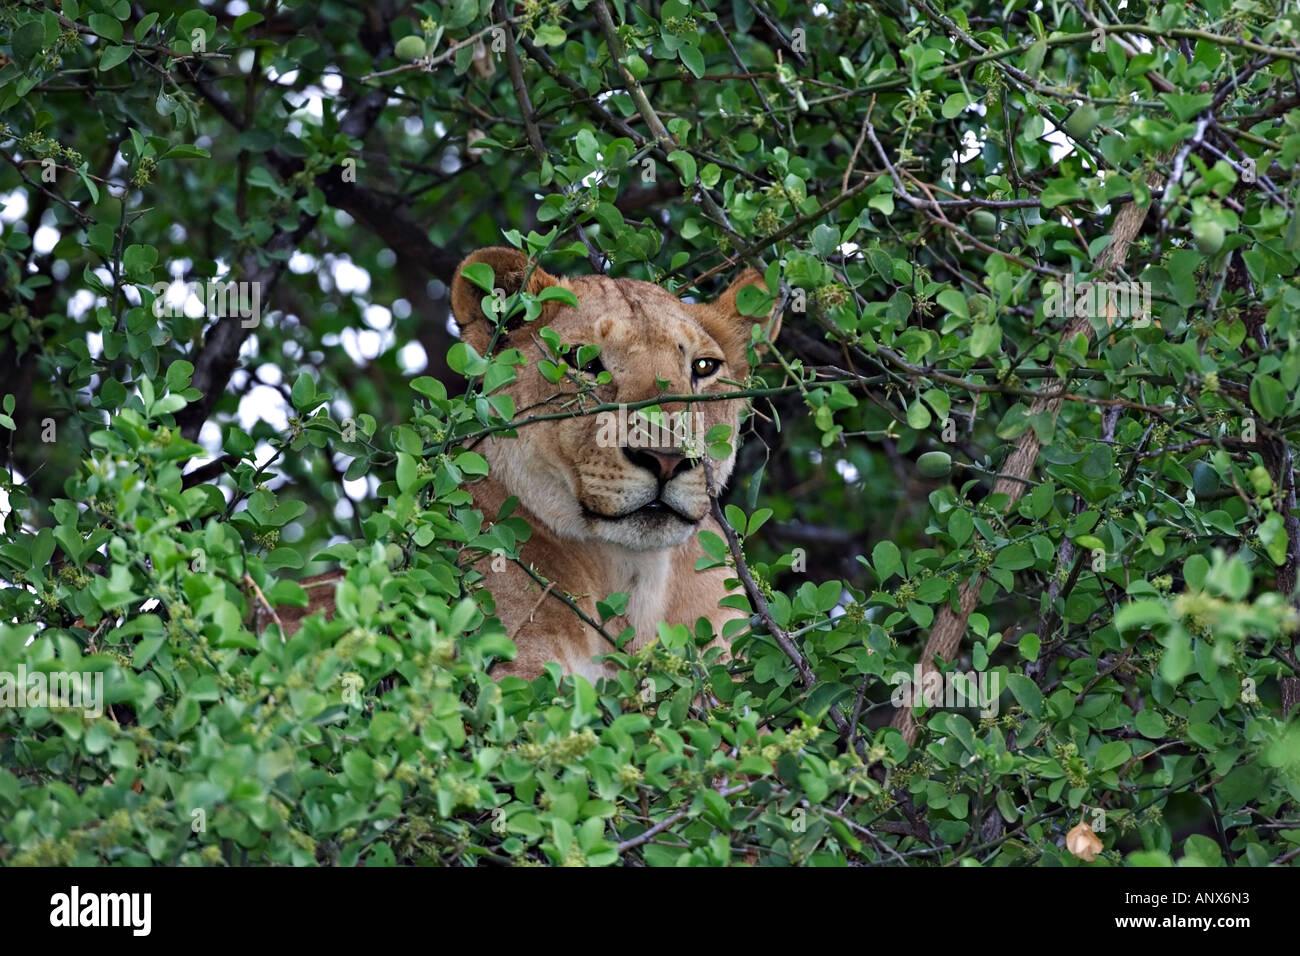 Africa, Tanzania, Lake Manyara National Park, Tree-climbing lion (Panthera leo) - Stock Image